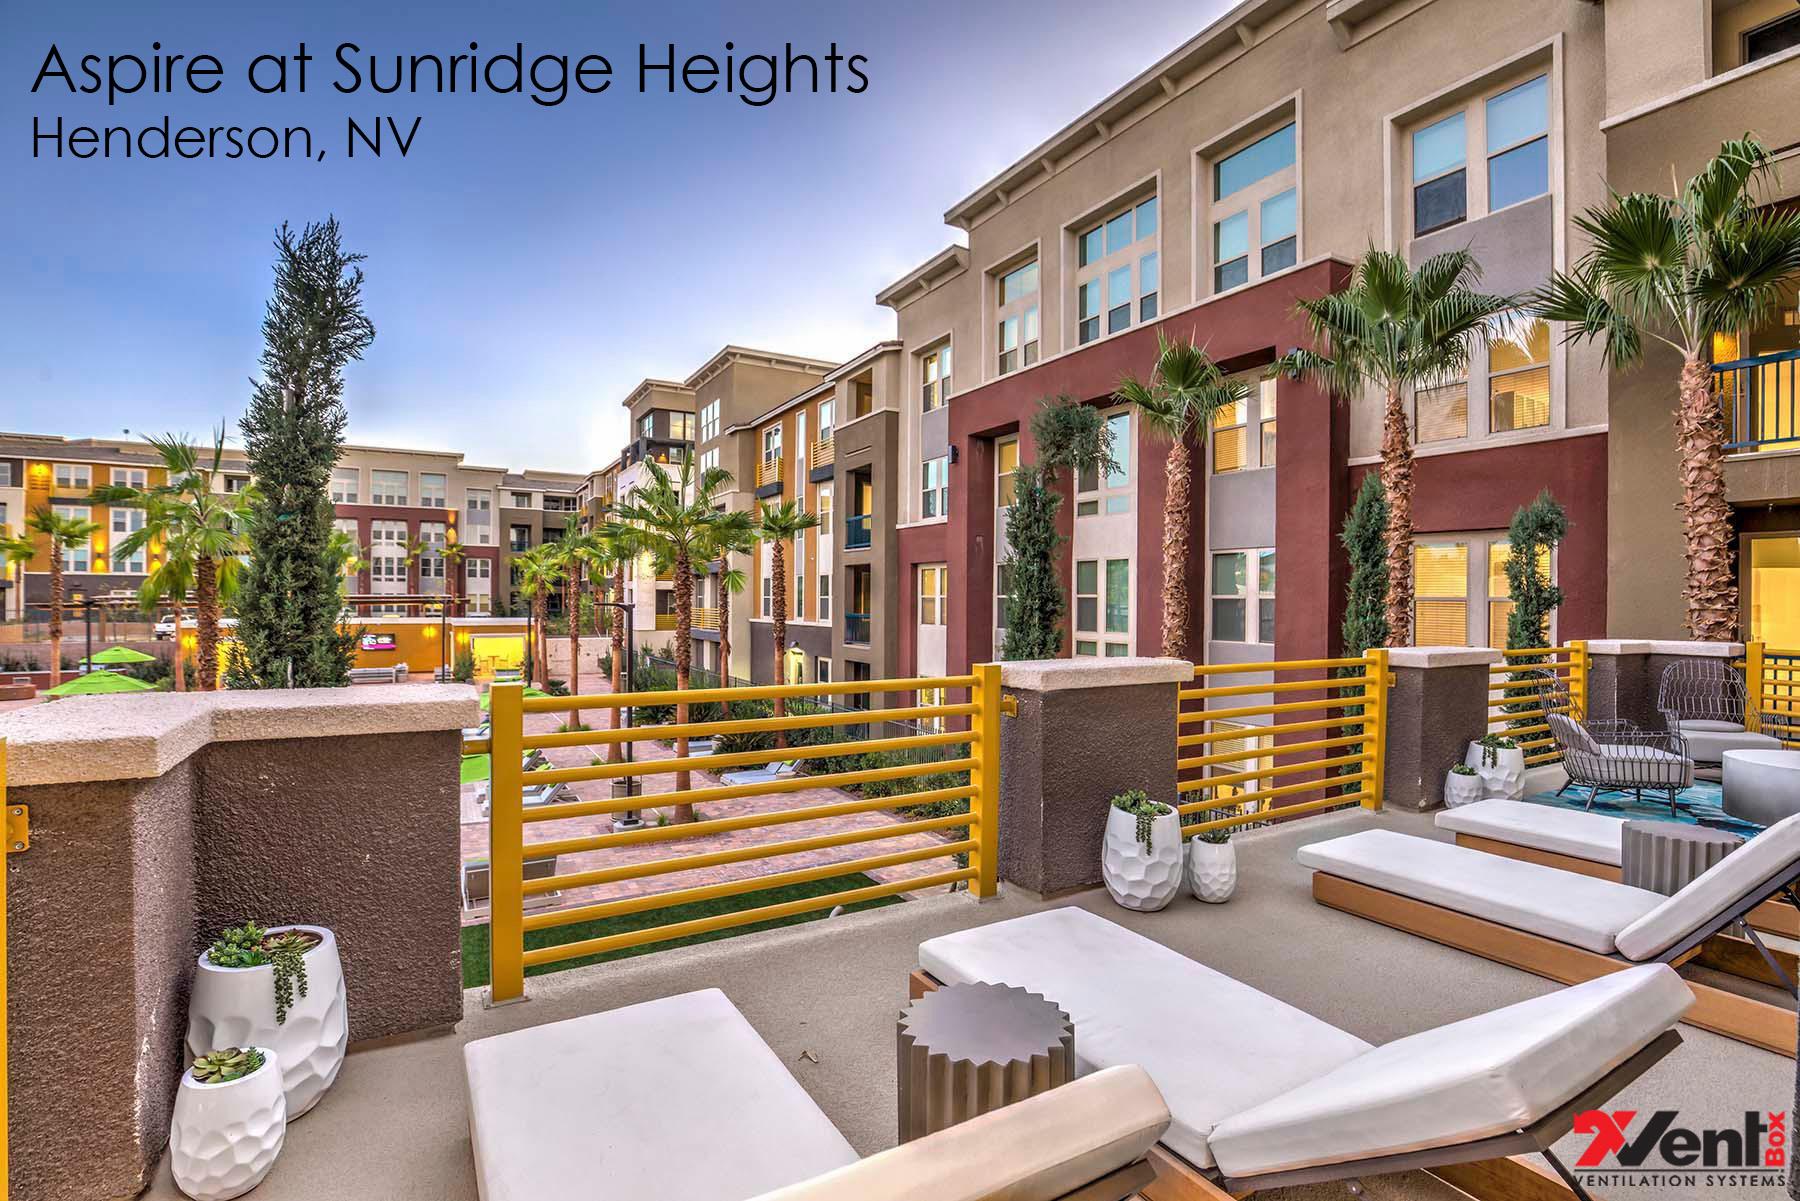 Aspire at Sunridge Heights